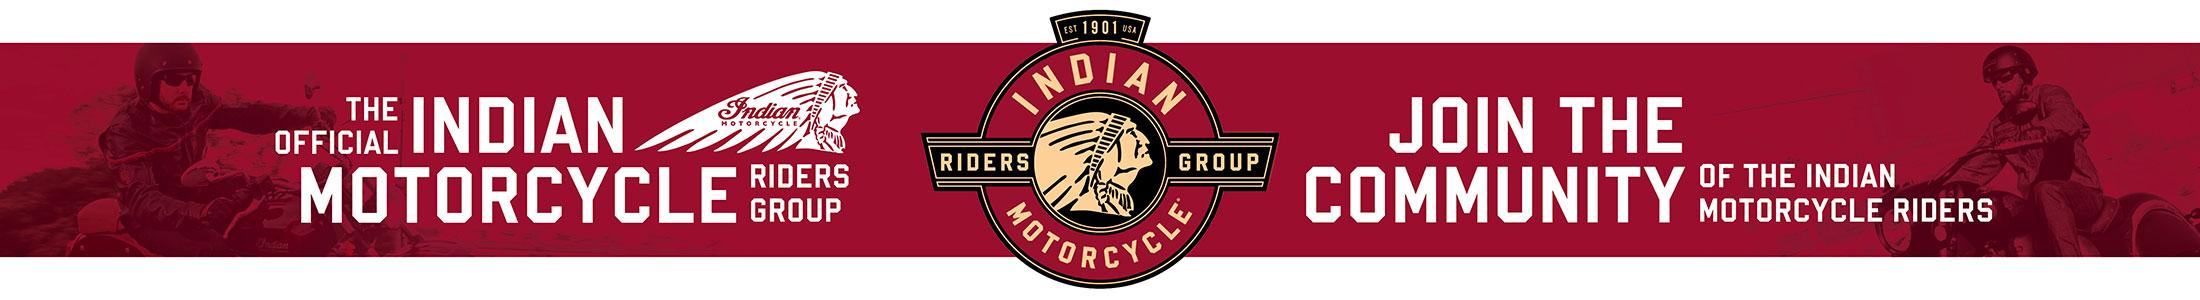 Indian Motorcycles Australia Indian Motorcycle Australia